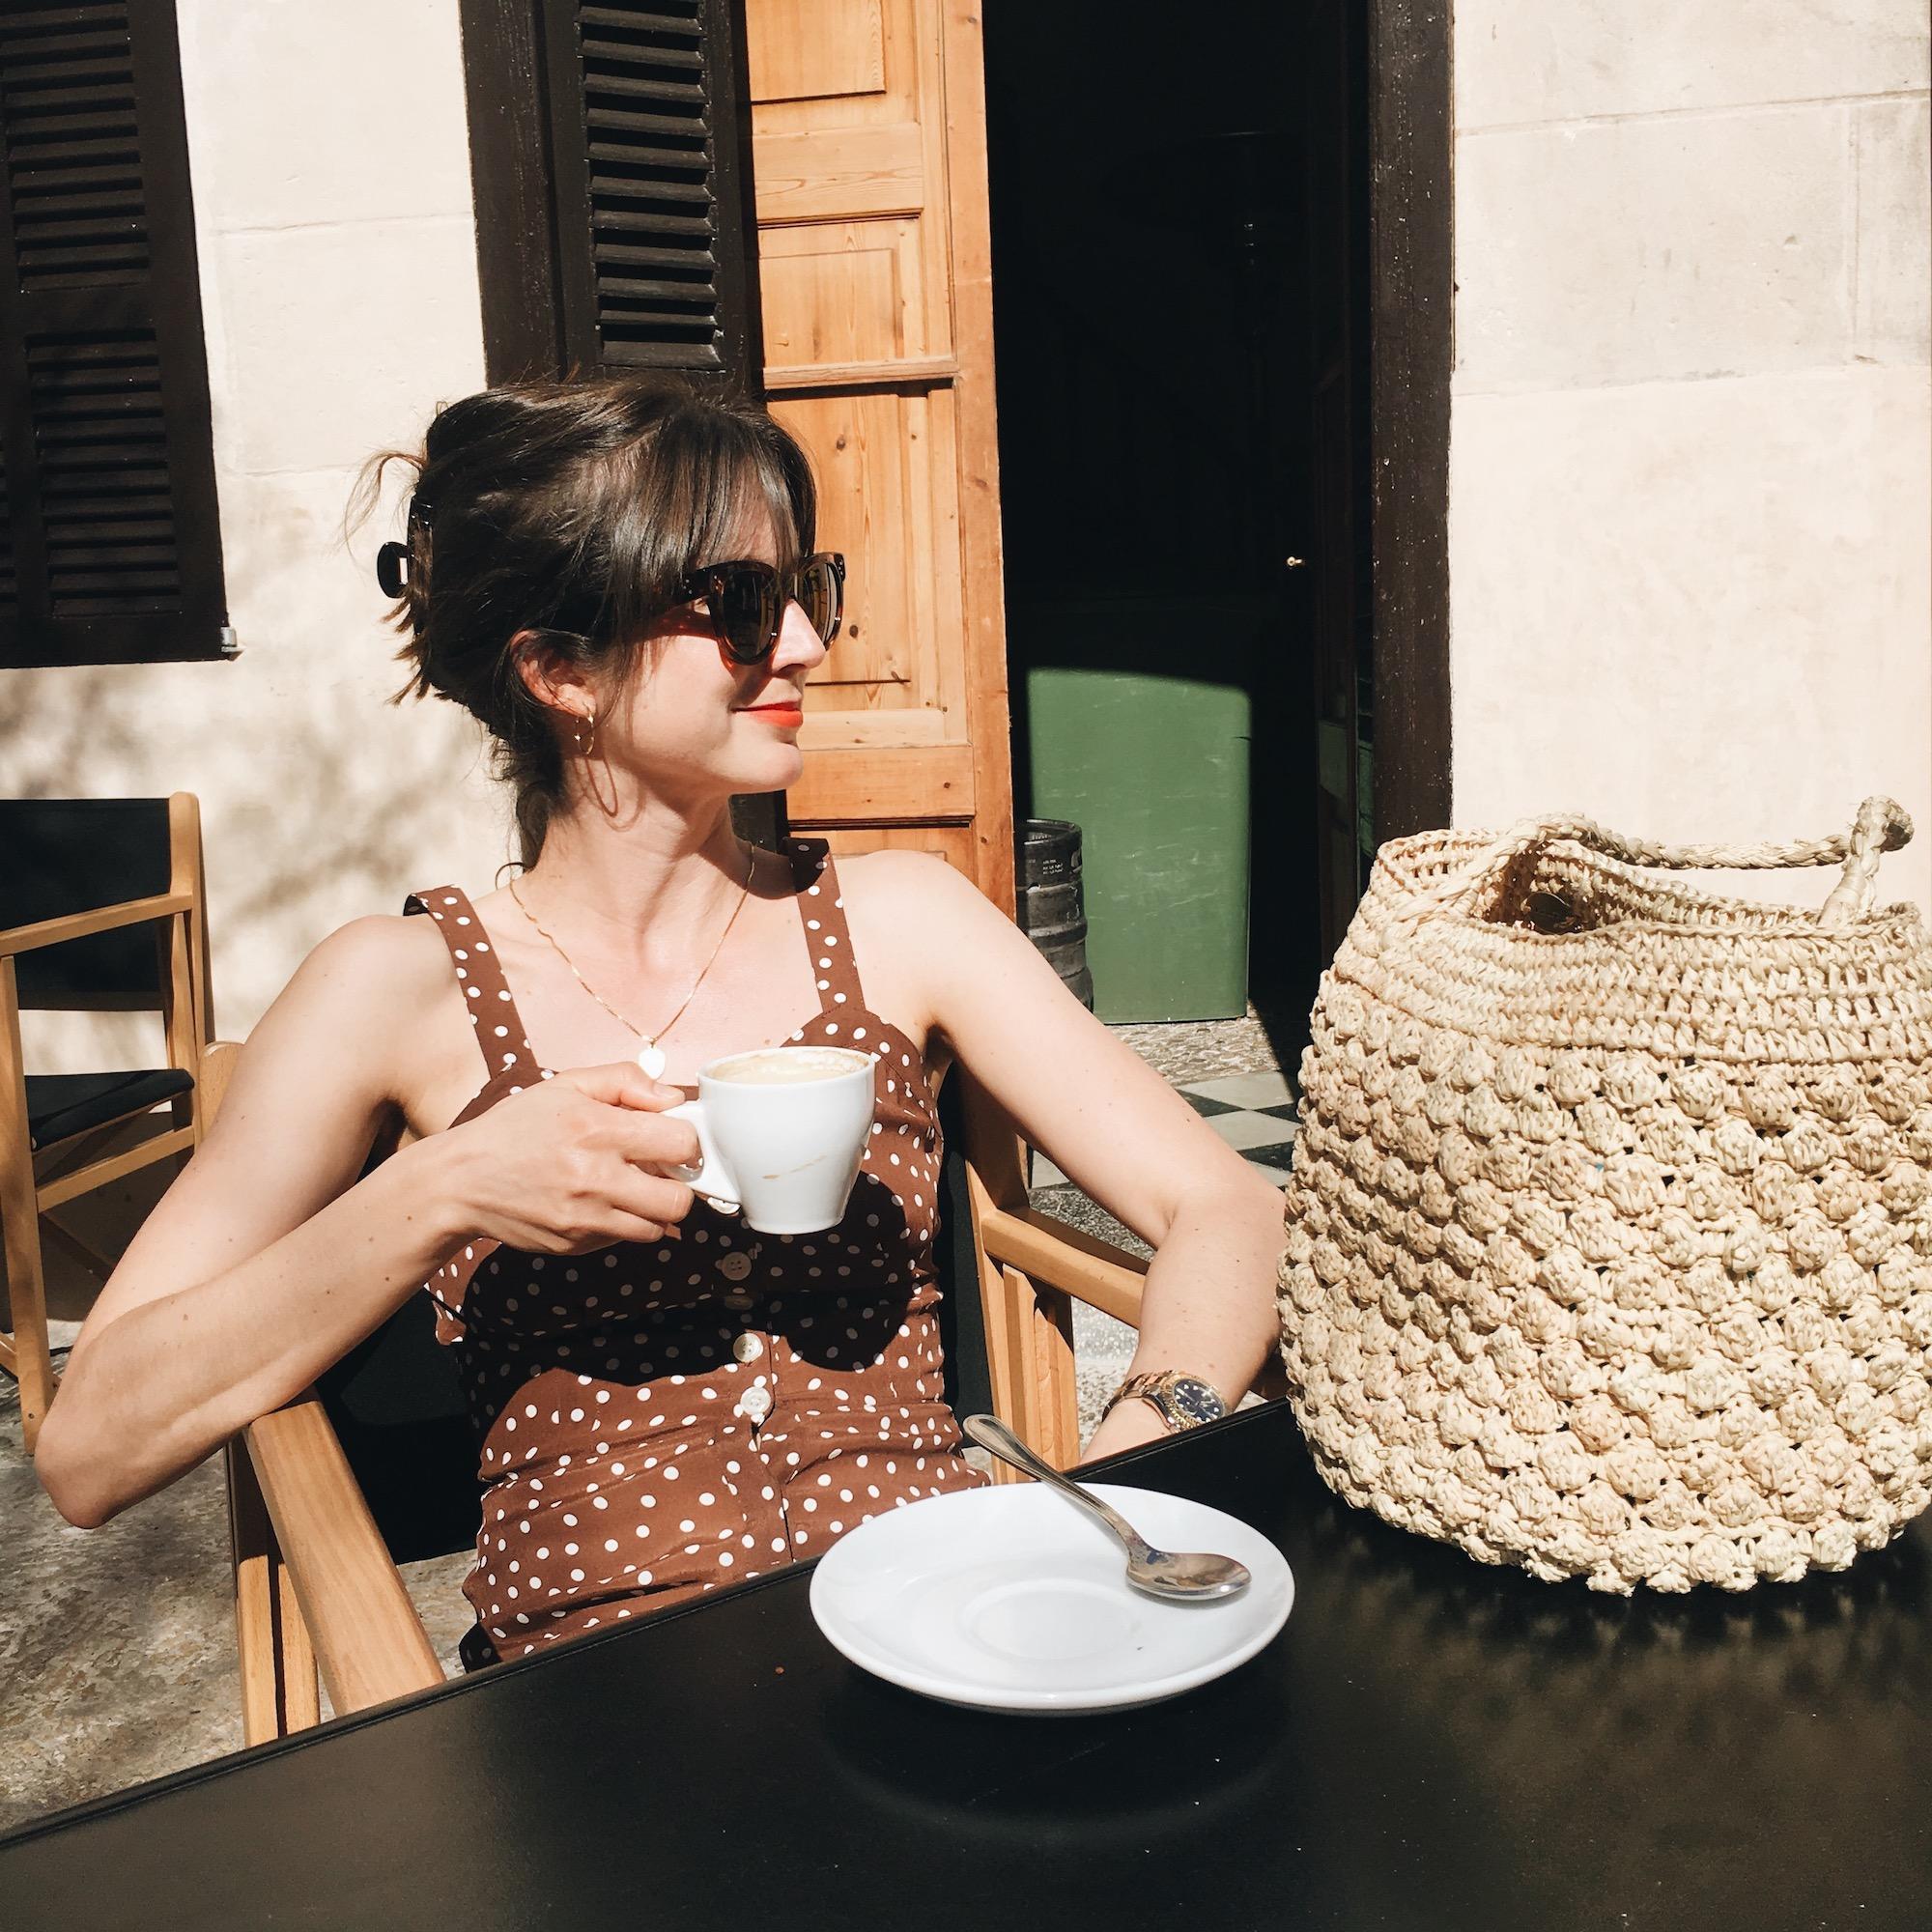 Reisebericht Mallorca mit Mallorcatipps auf meinem Modeblog